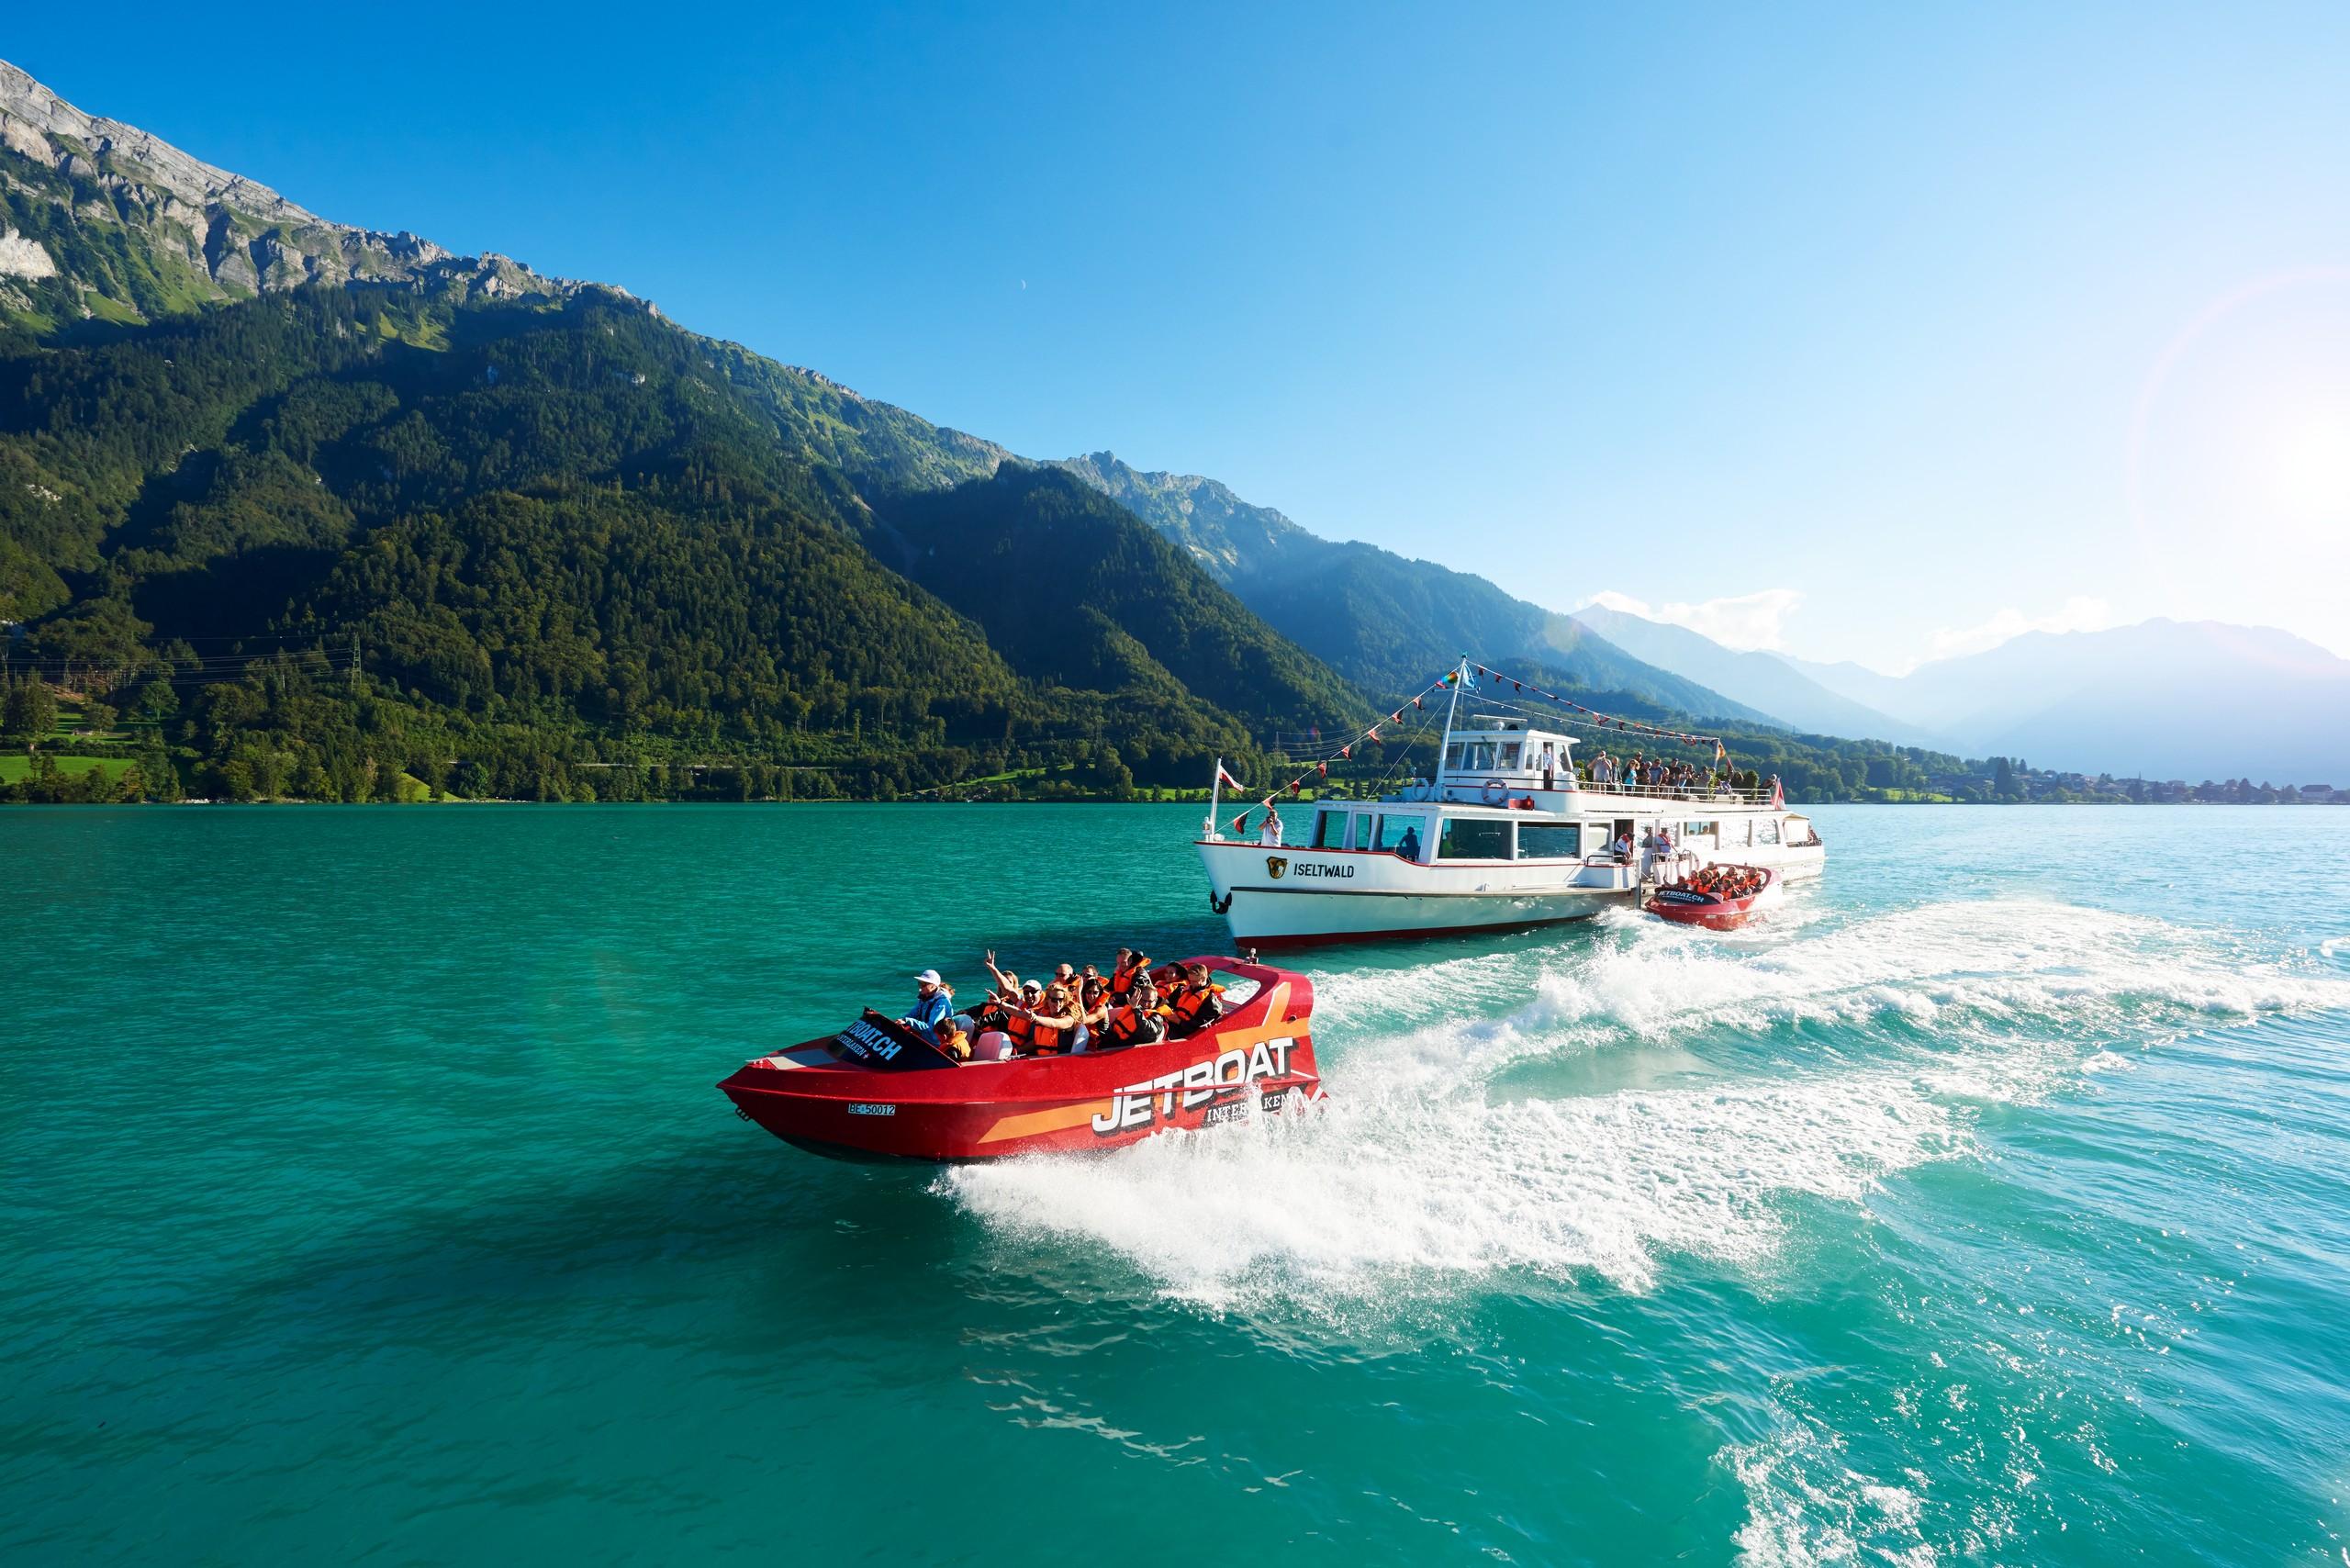 boenigen-jetboat-sommer-brienzersee-panorama-kursschiff-berge-boot-pedalo